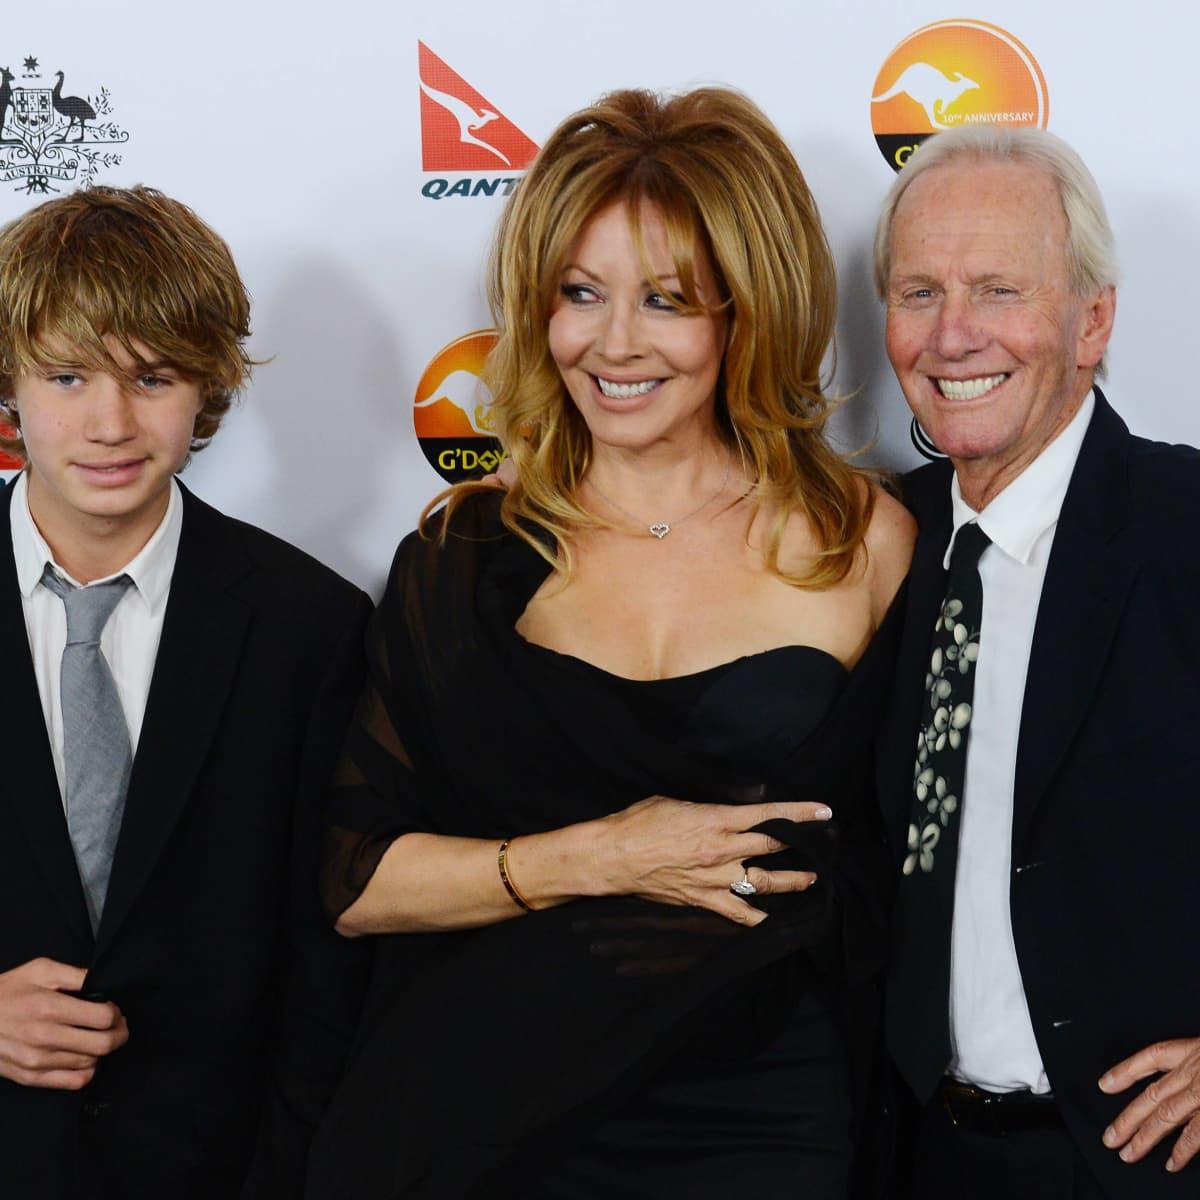 Linda Kozlowski And Paul Hogan: This Is Their Son Chance